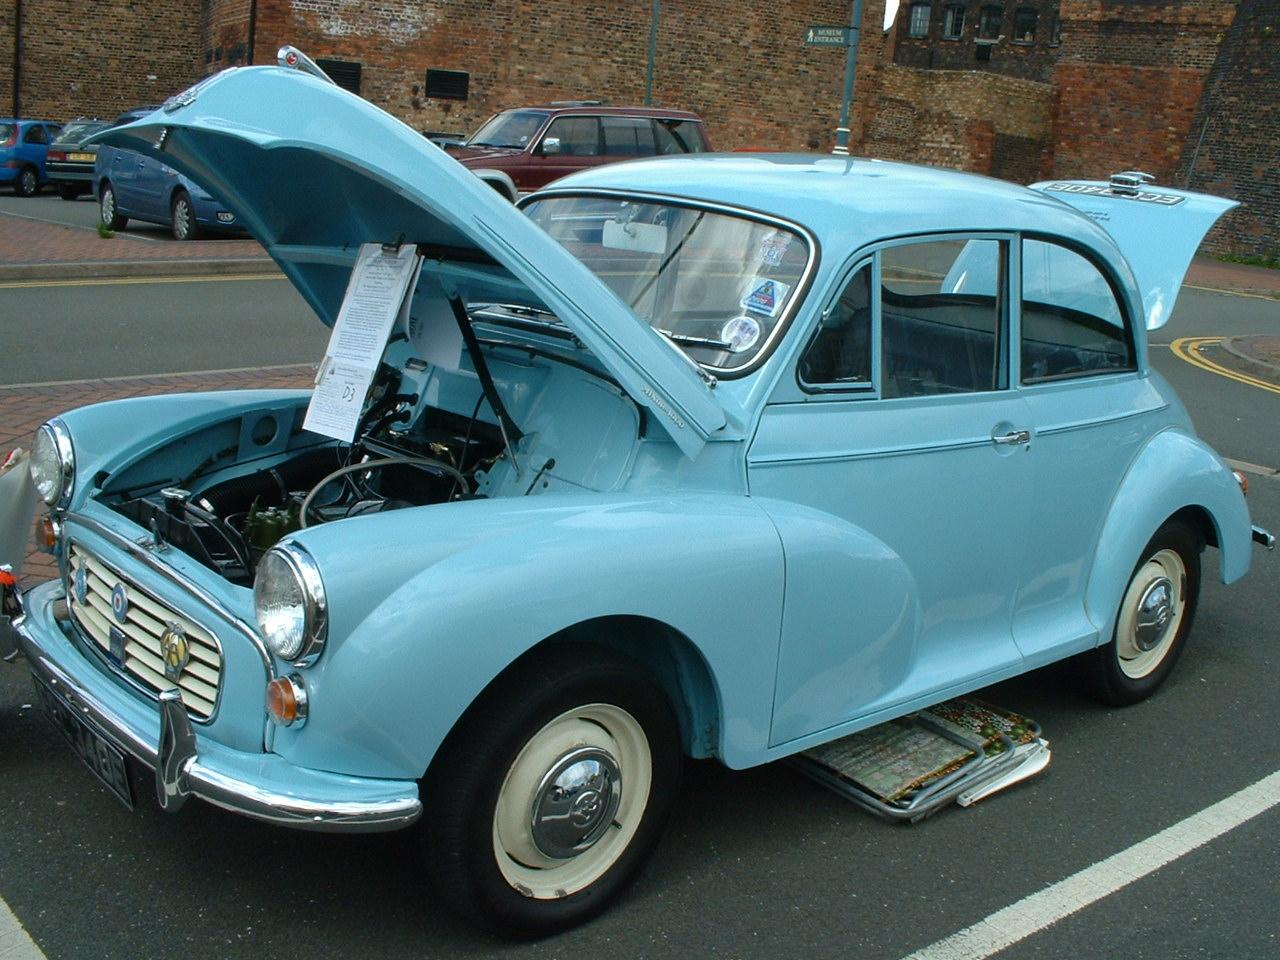 1967 Morris Minor 1000 Saloon